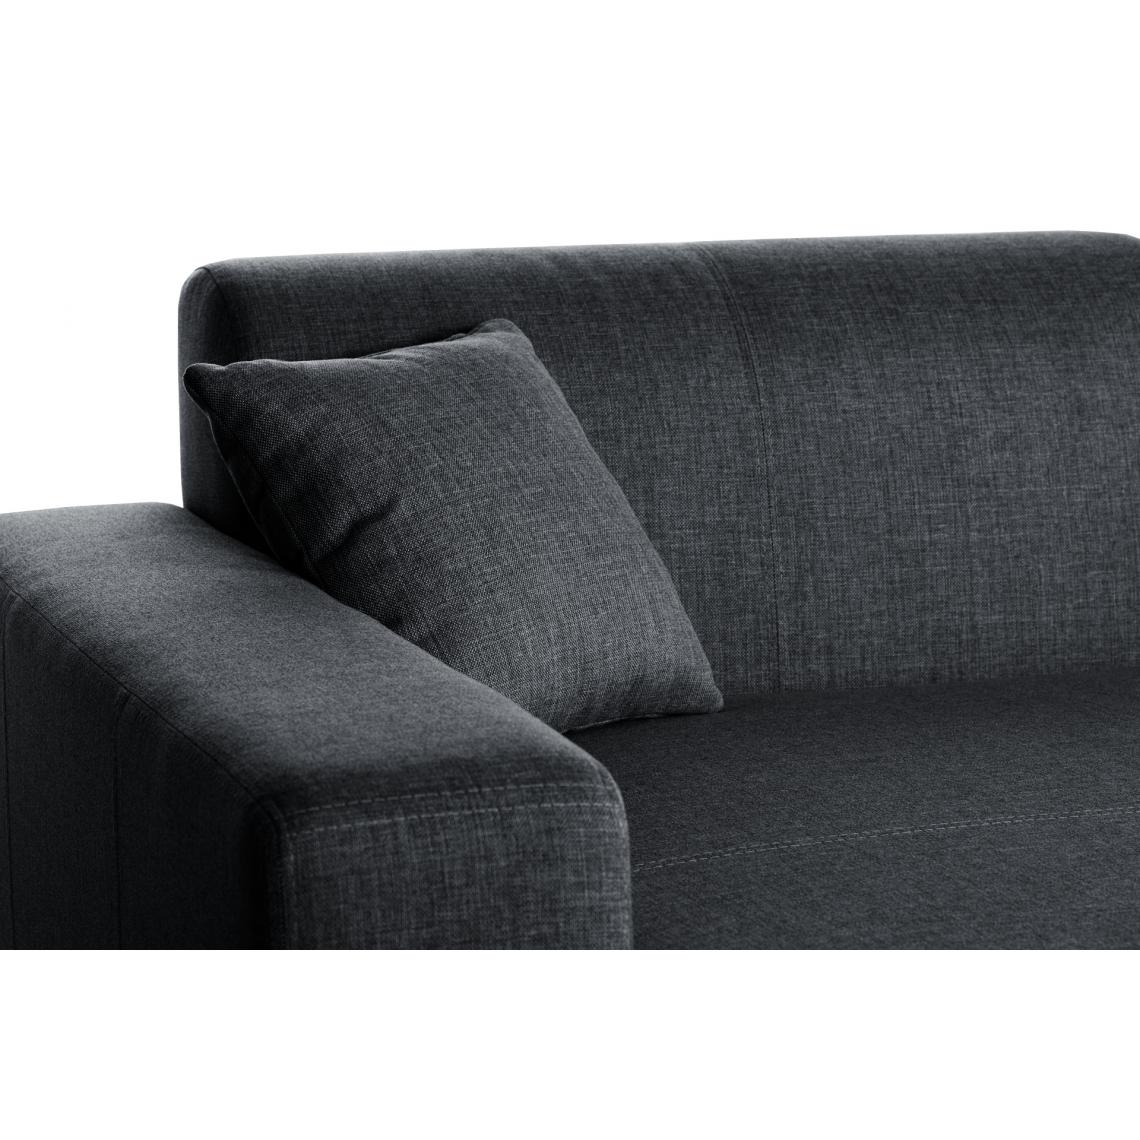 Canapé d'angle gauche Gris profond TERAZZA YG3ct